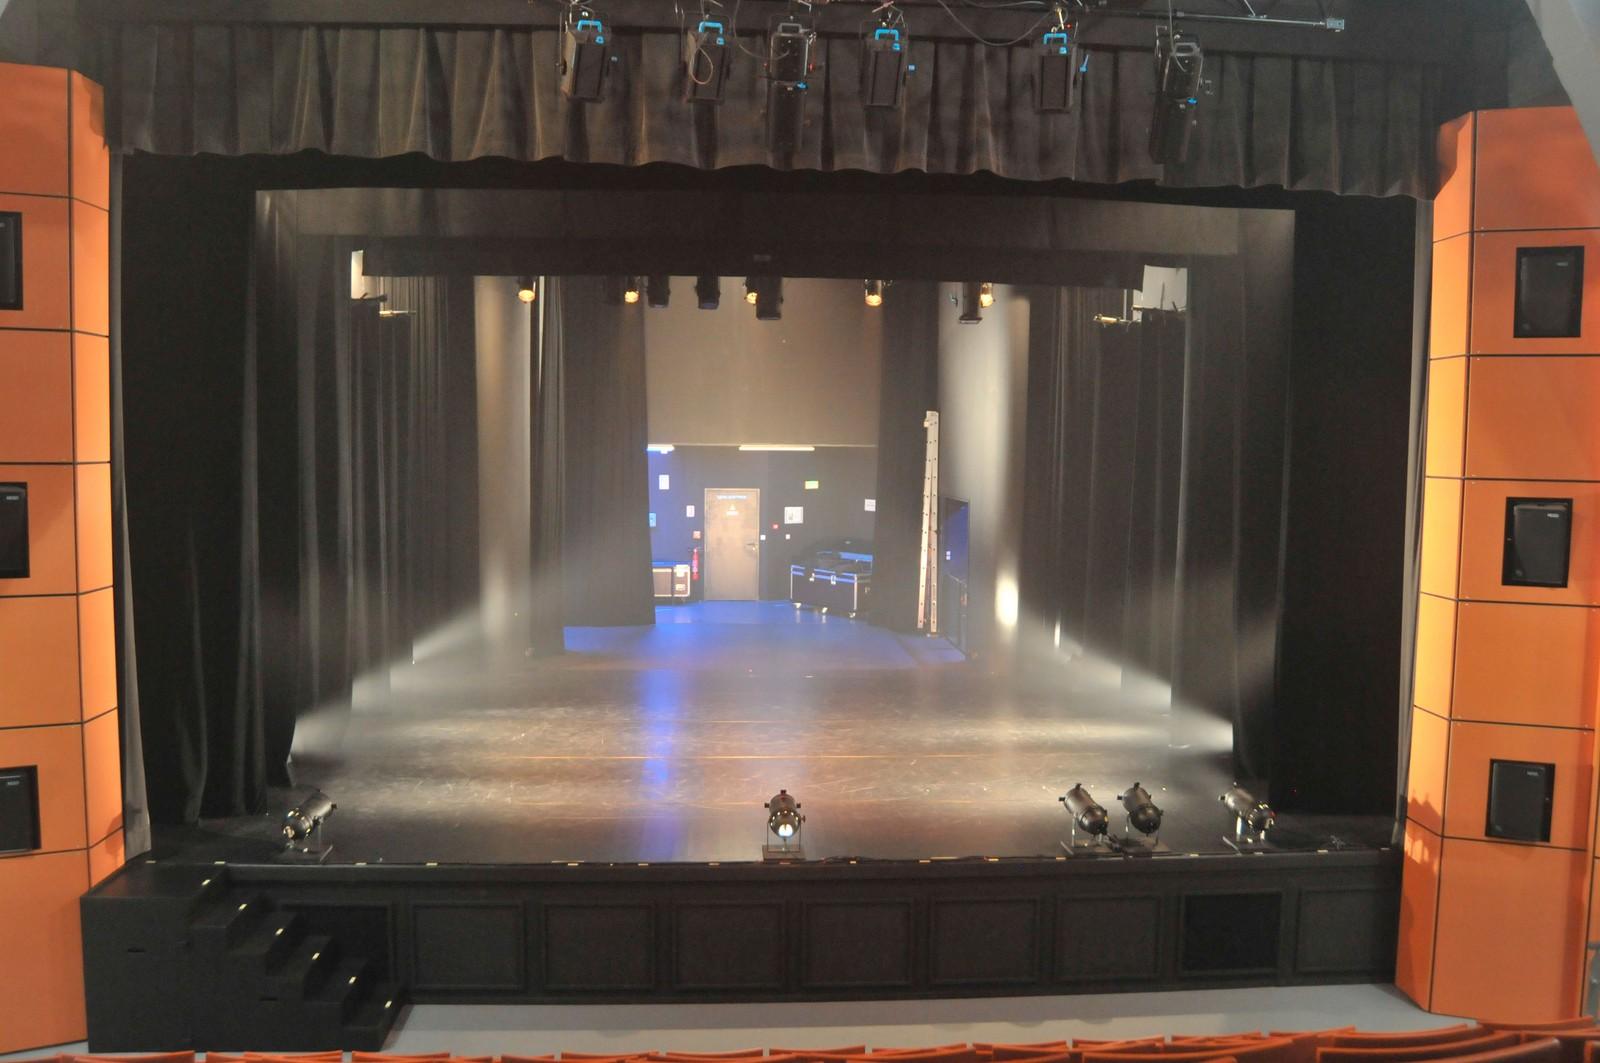 Scène du Geyser salle de spectacle Bellerive sur Allier